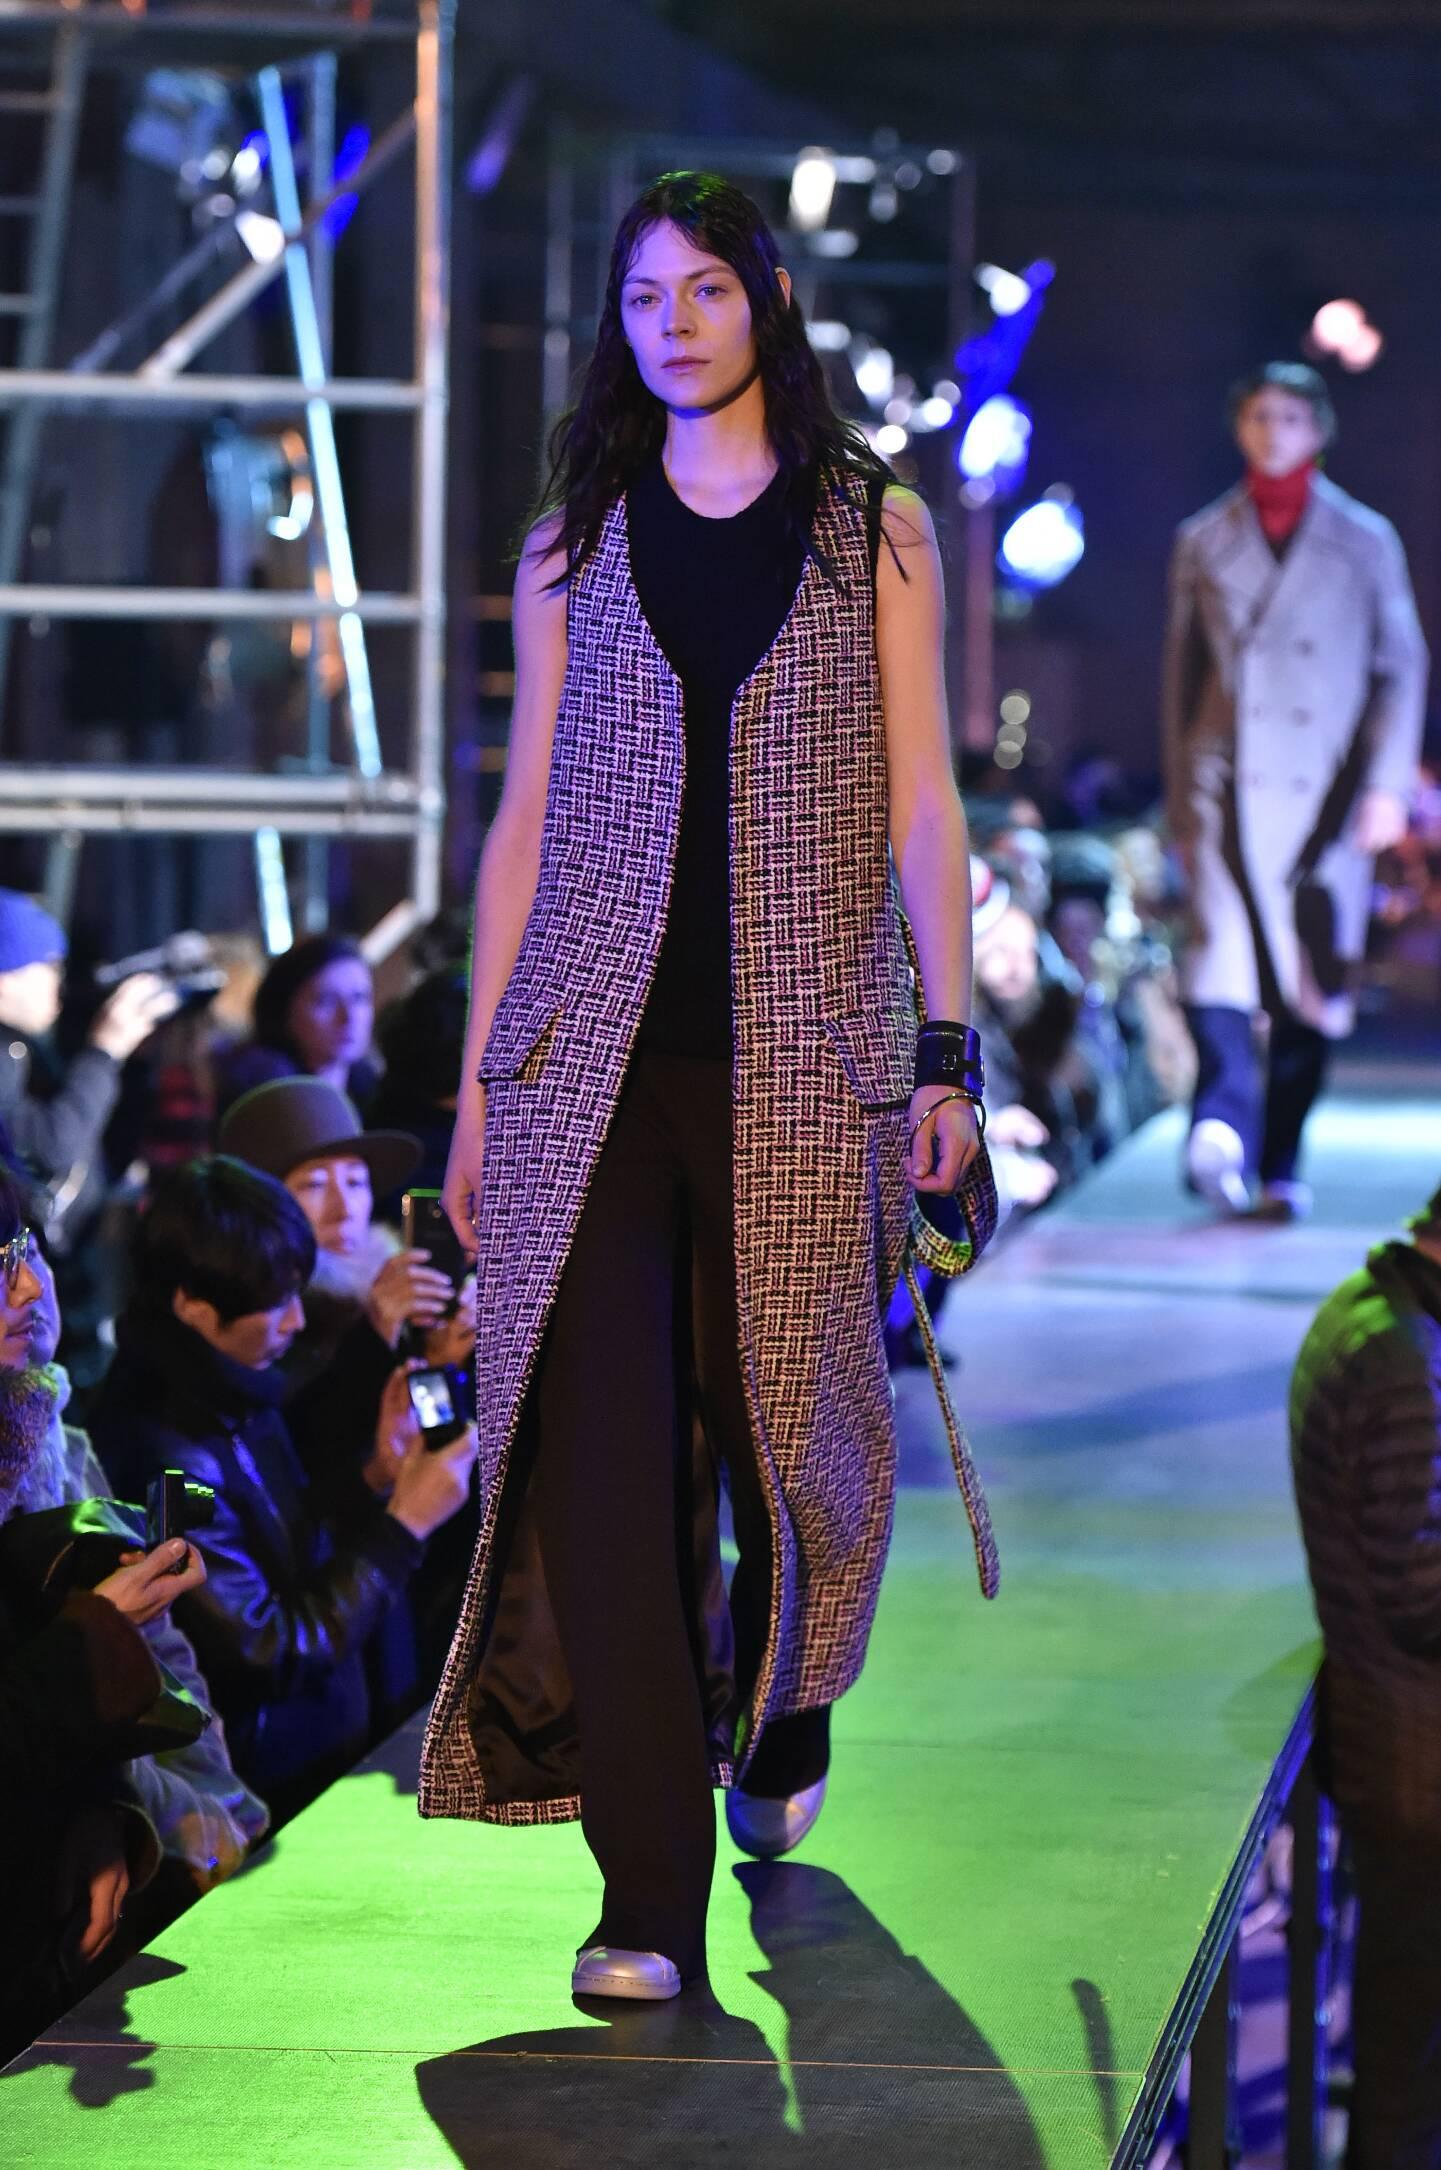 Fashion Model Raf Simons Collection Catwalk